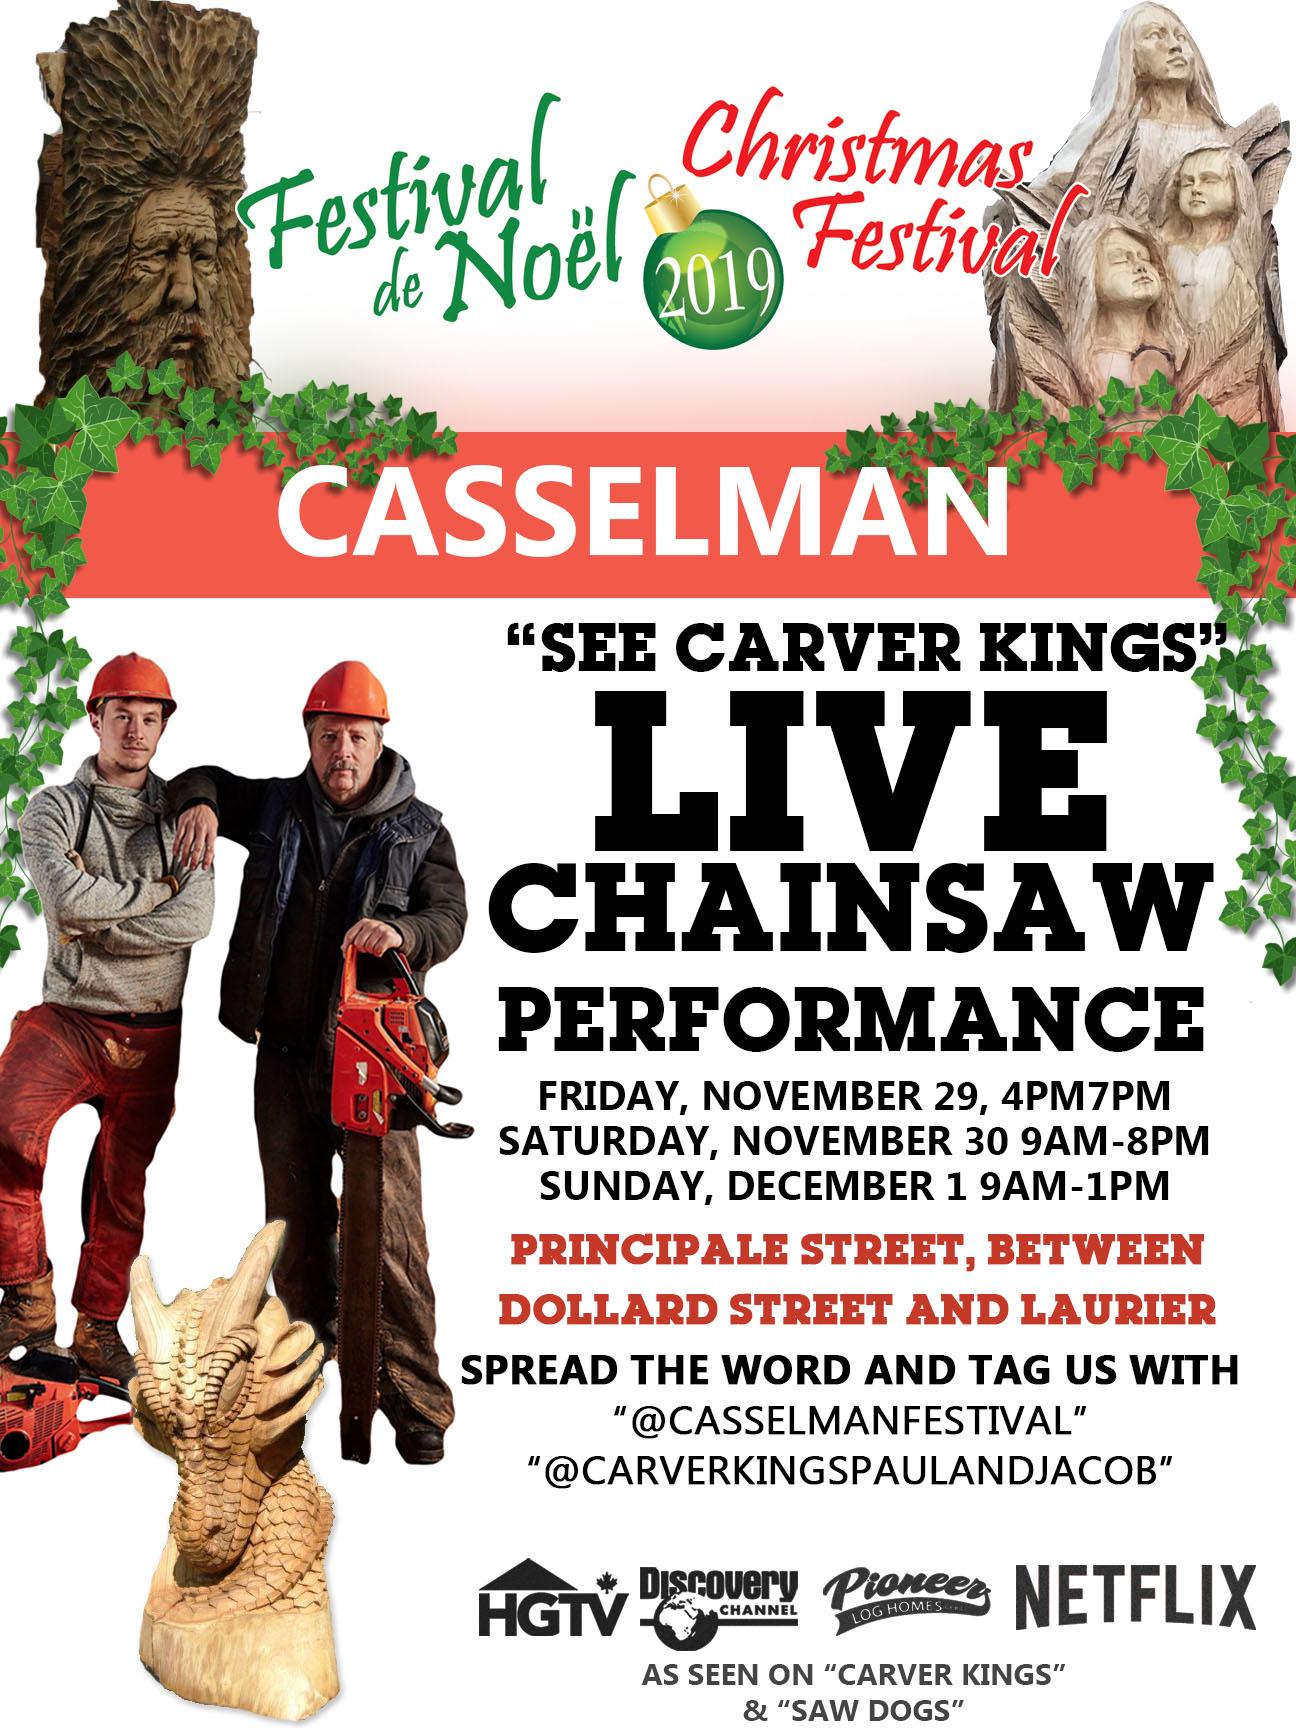 casselman winter festival